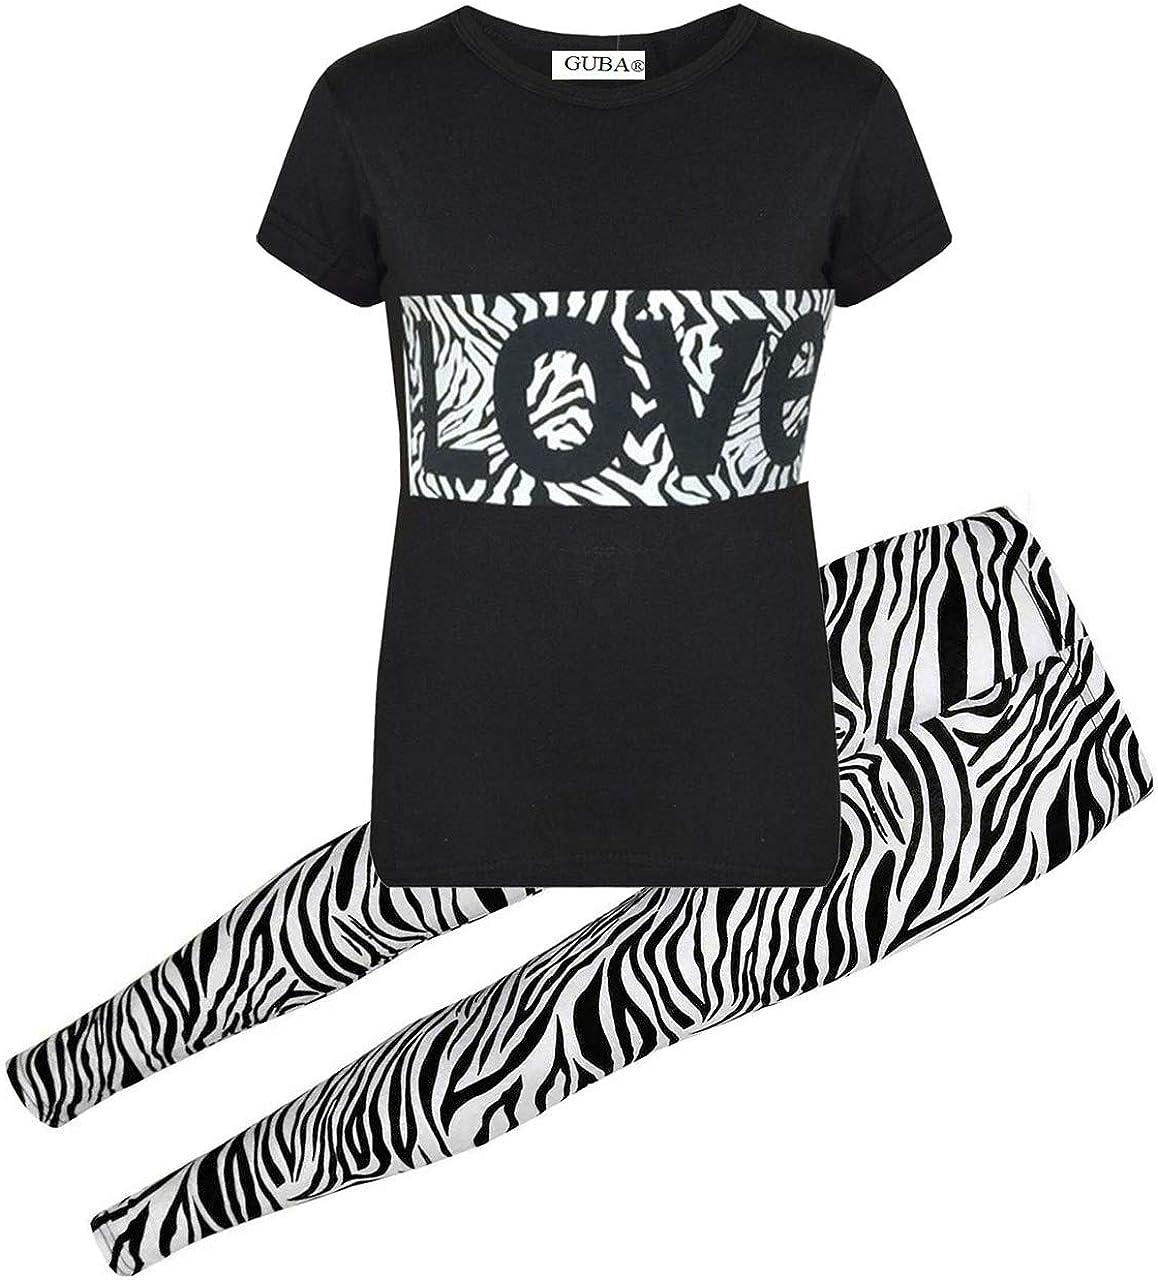 GUBA/® Girls Love Zebra T-Shirt TOP /& Legging Set Summer WEAR Age 7-13 YRS